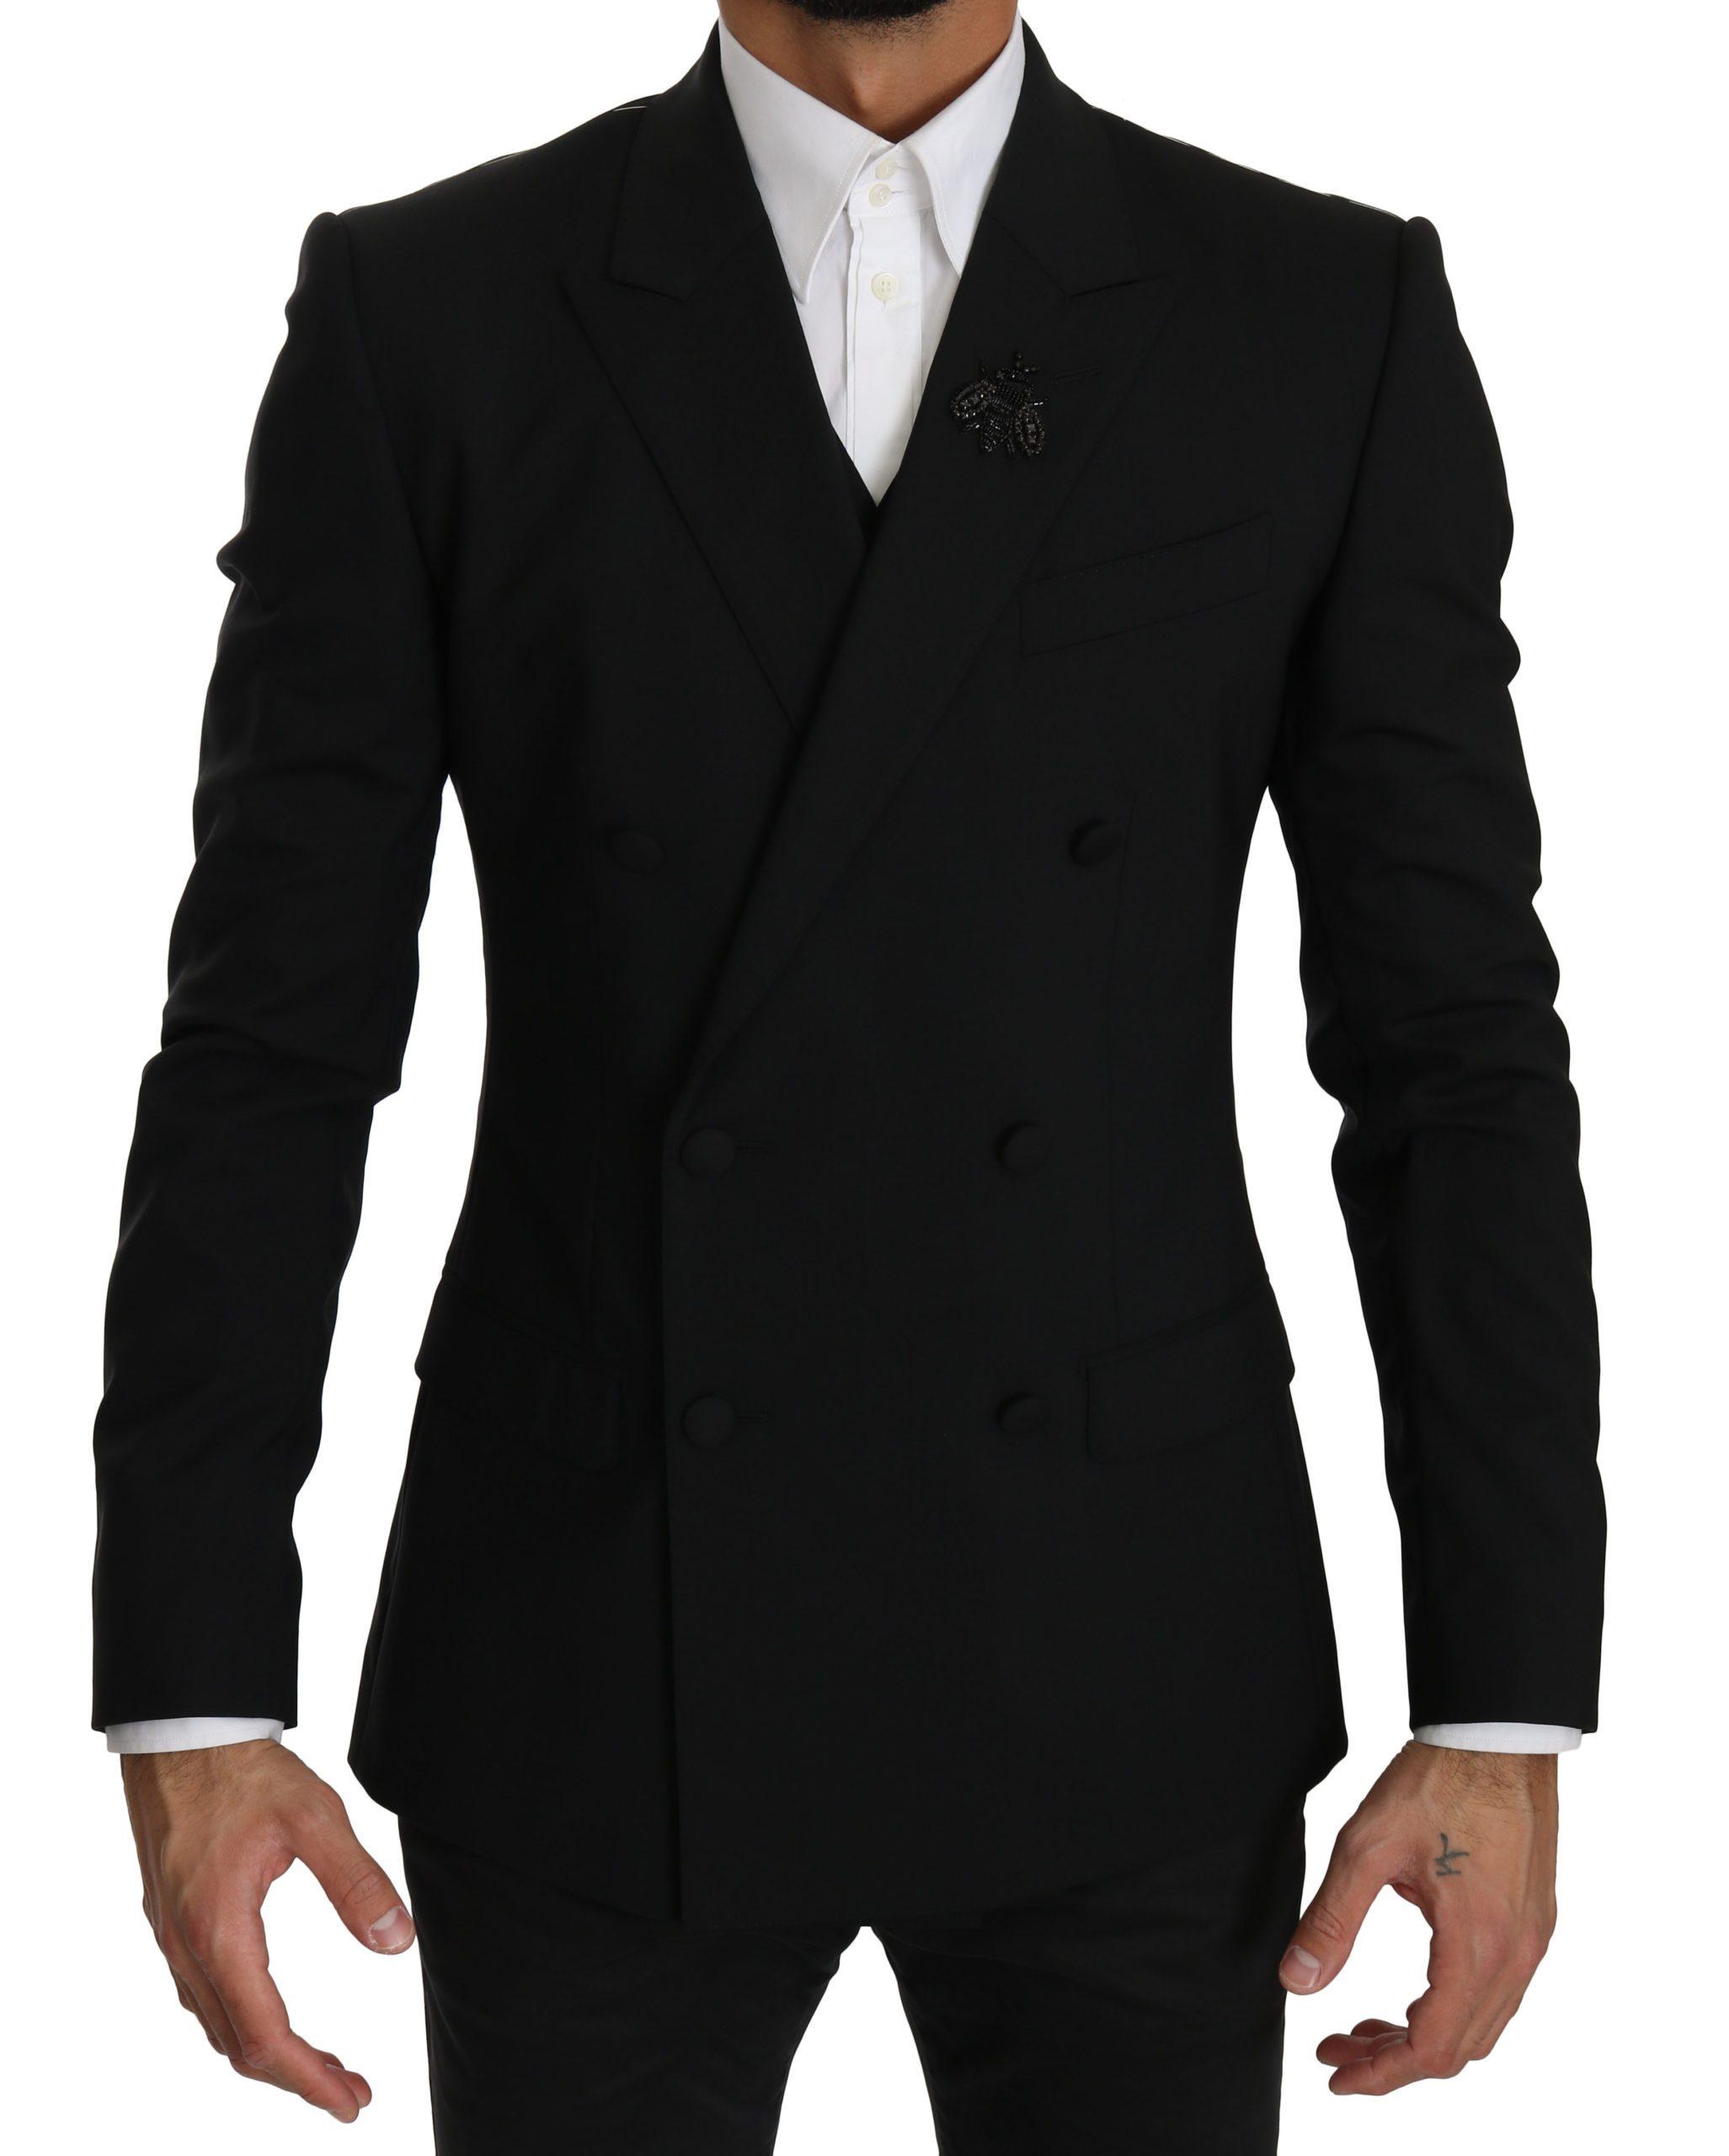 Dolce & Gabbana Men's Wool Stretch Crystal MARTINI Jacket Black KOS1603 - IT46   S